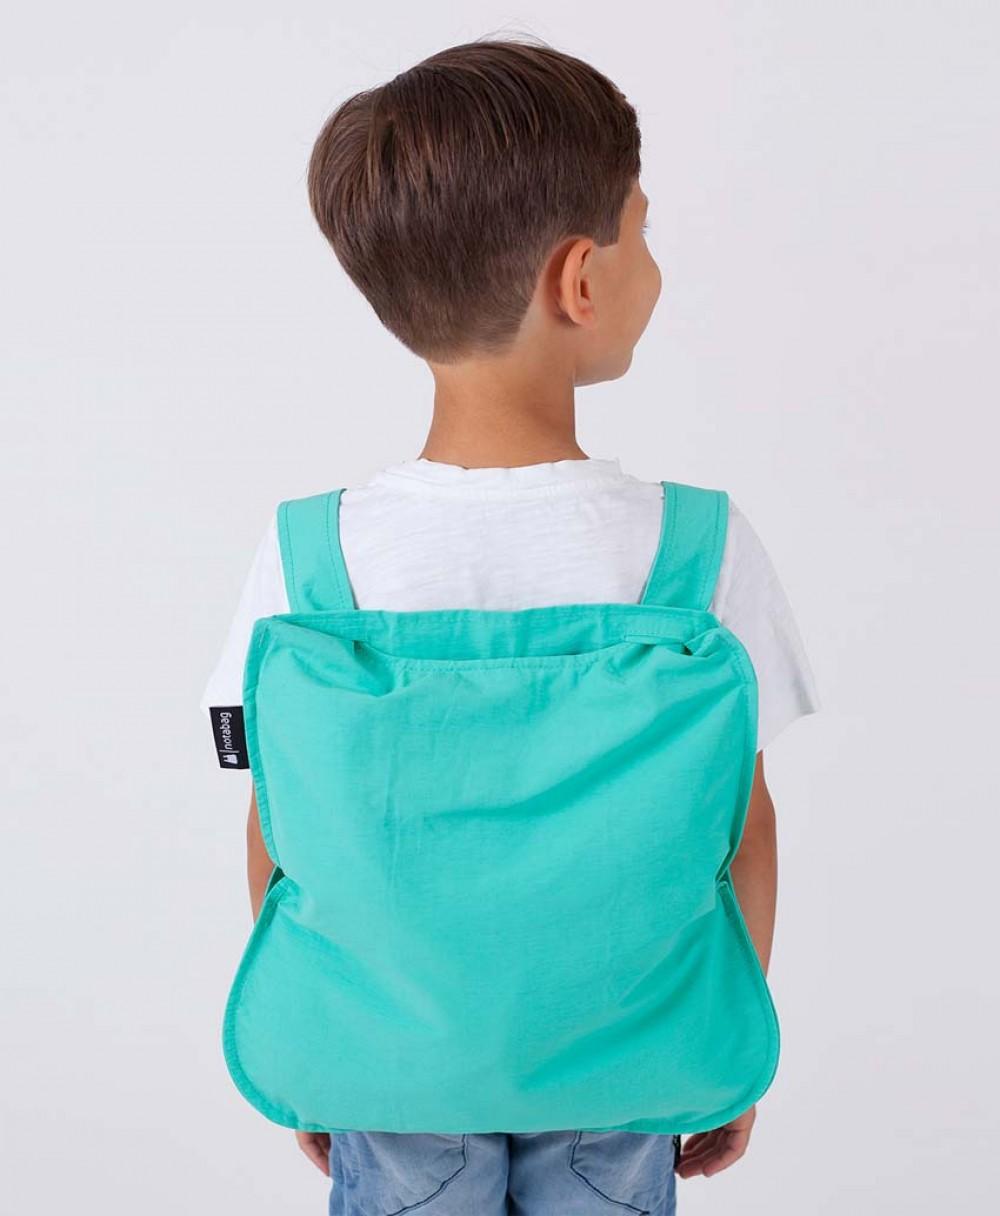 352d8ab98fc ... Notabag KIDS Παιδική Τσάντα χειρός / Σακίδιο πλάτης - Κόκκινο. Zoom ·  lightbox moreview · lightbox moreview